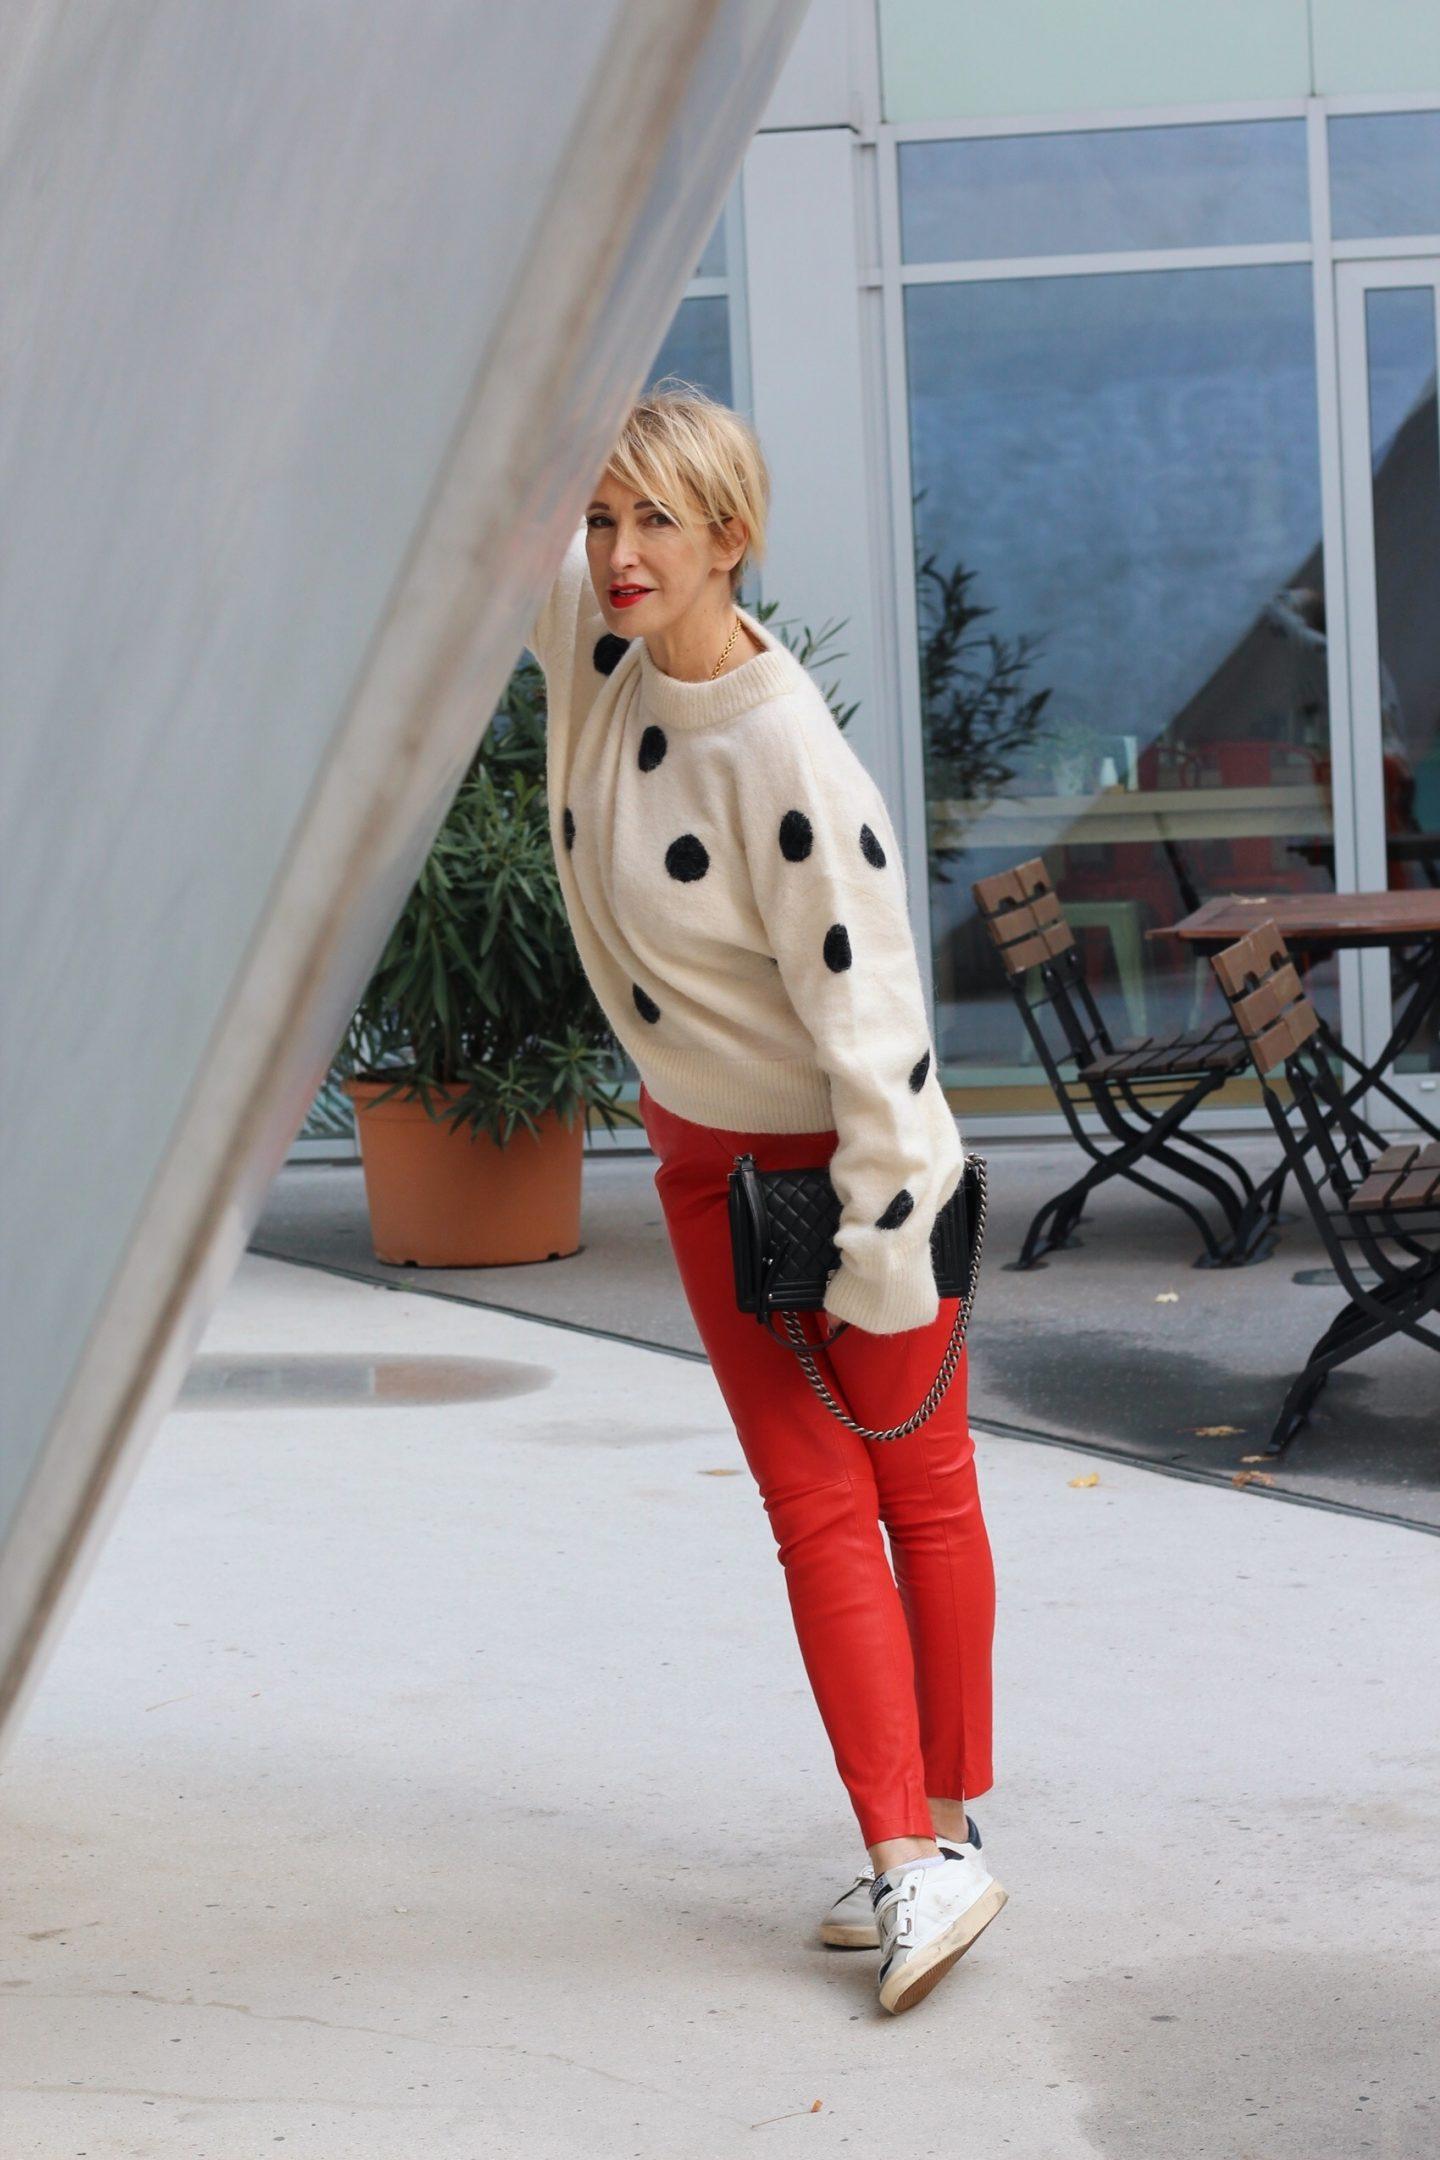 glamupyourlifestyle rote-Lederleggings Neujahrsvorsatz ue-40-blog ue-50-blog ü-40-mode